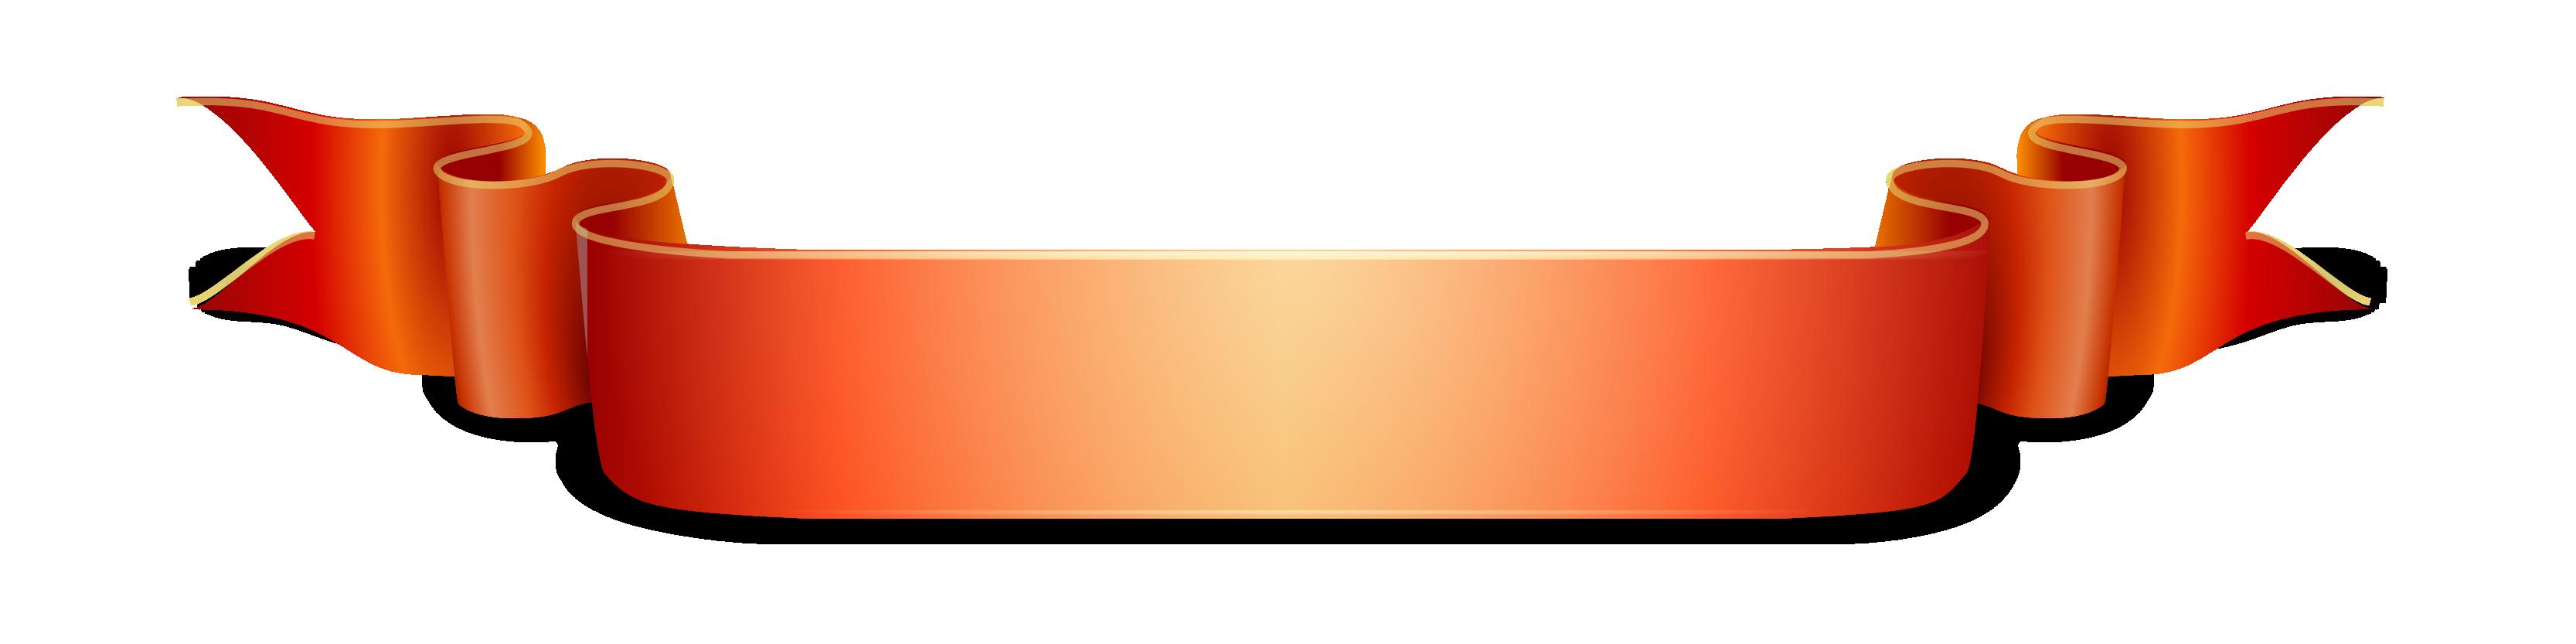 Winning clipart ribbon logo Free Download Art Ribbon Clipart